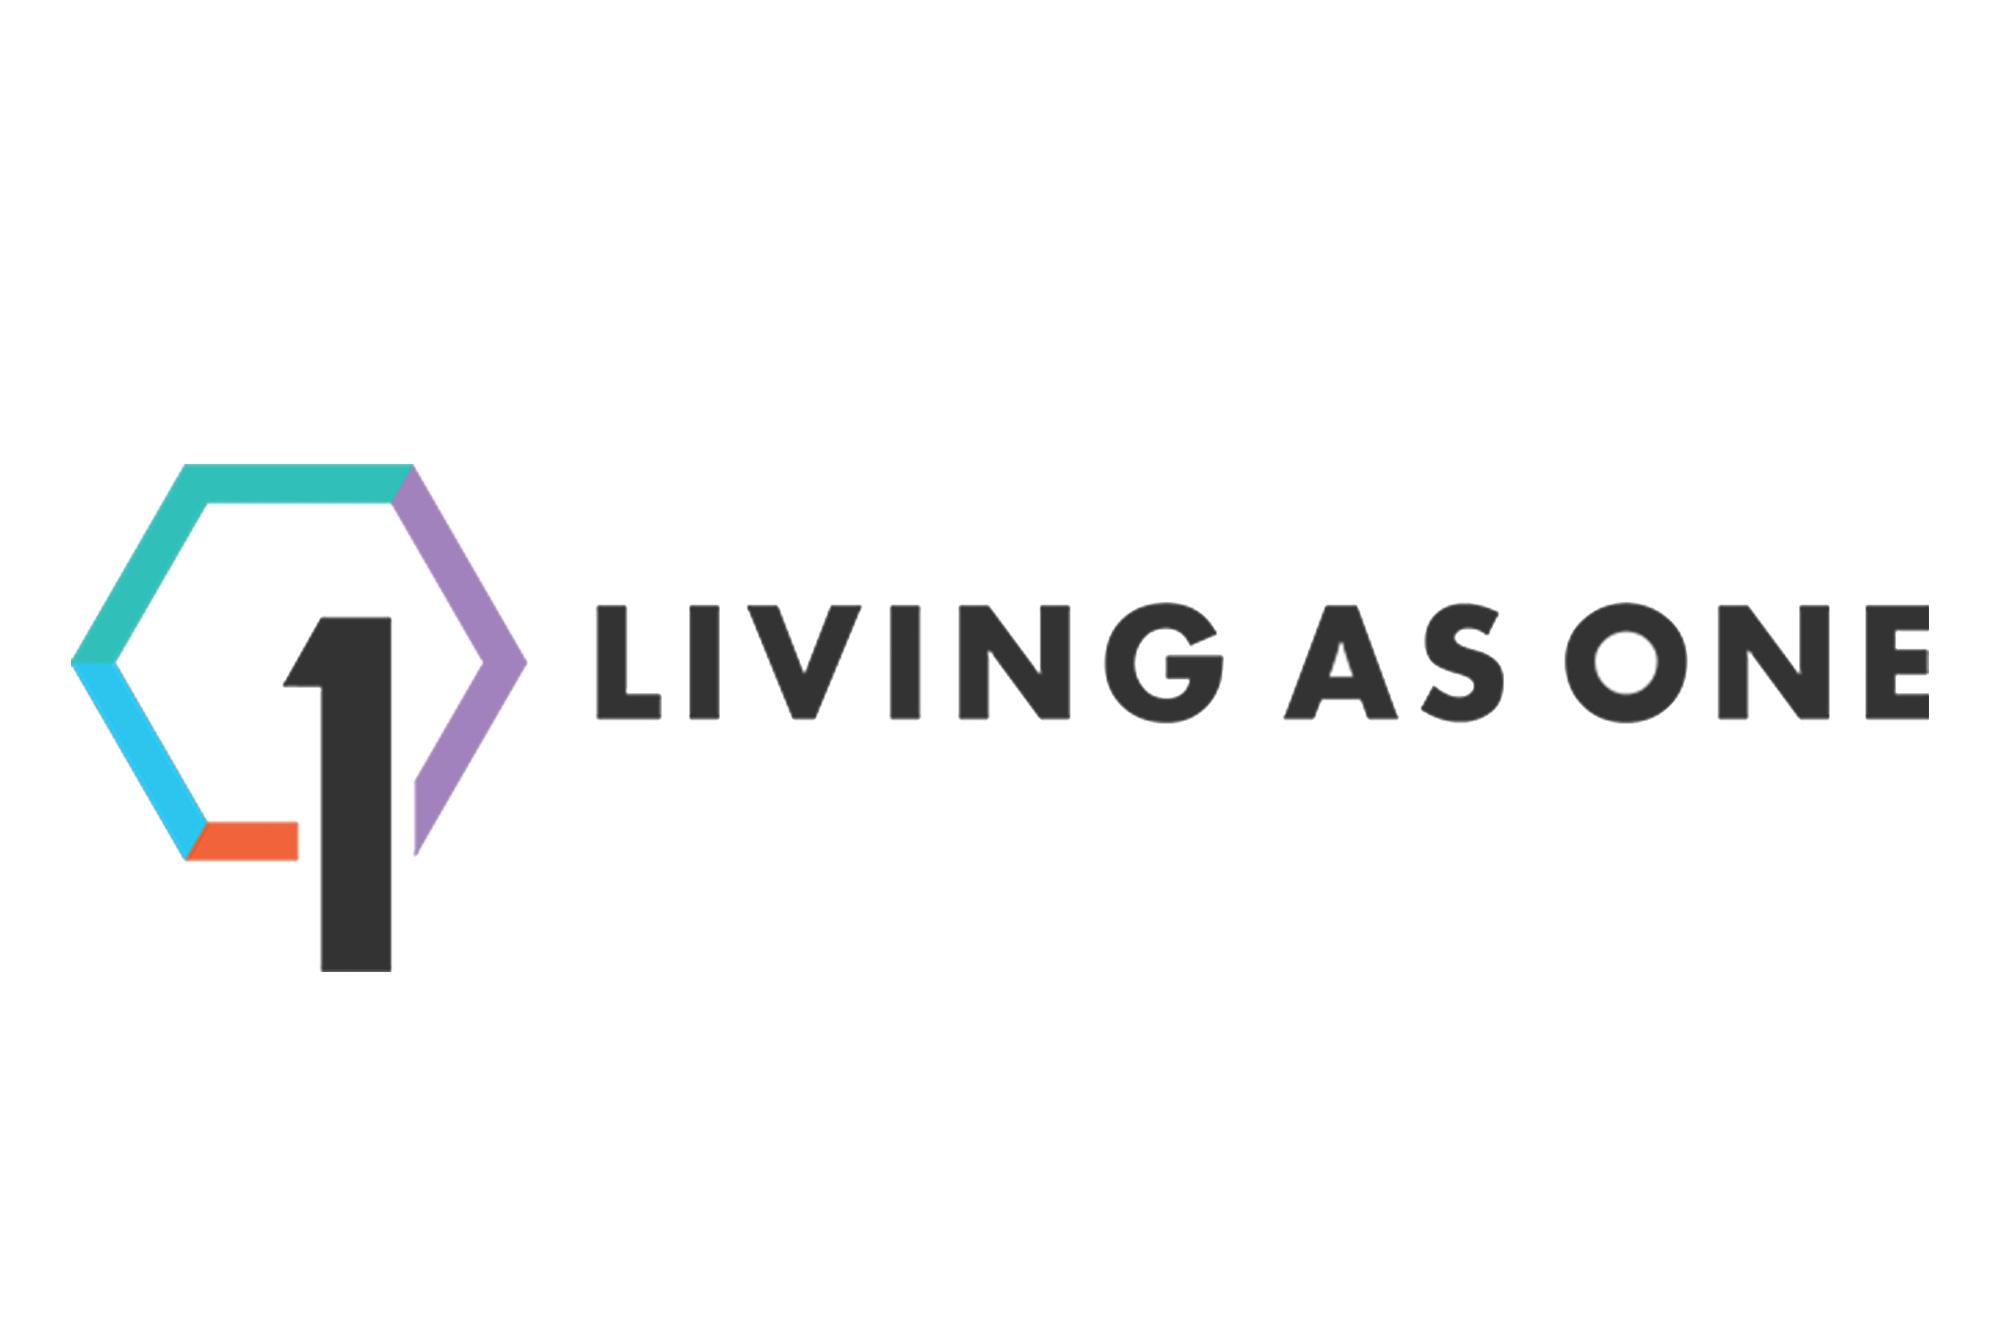 LivingAsOneLogo.jpg